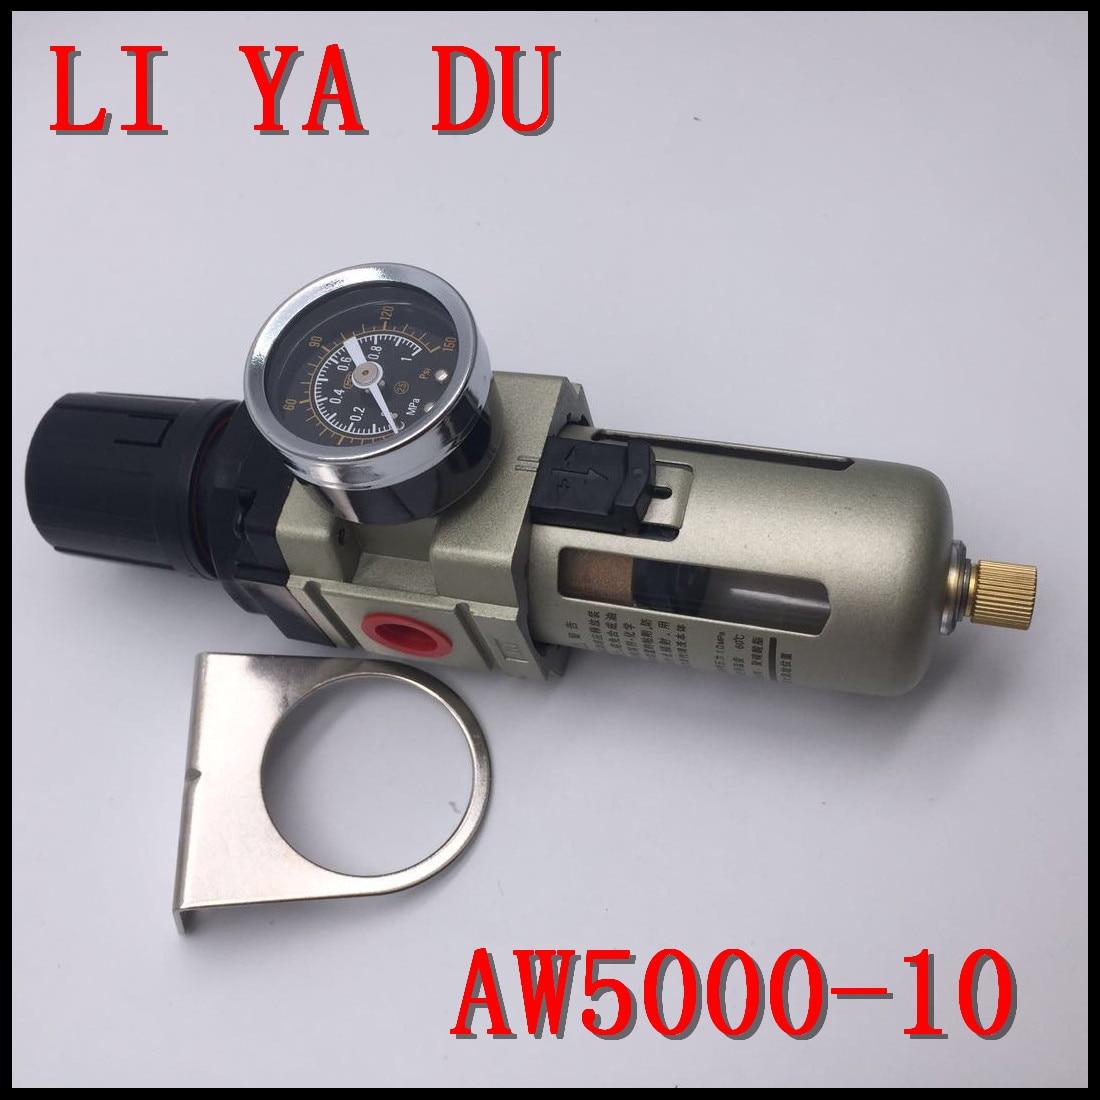 AW5000-10 G1 Pneumatic air compressor filter pressure reducing valve regulating valve цена